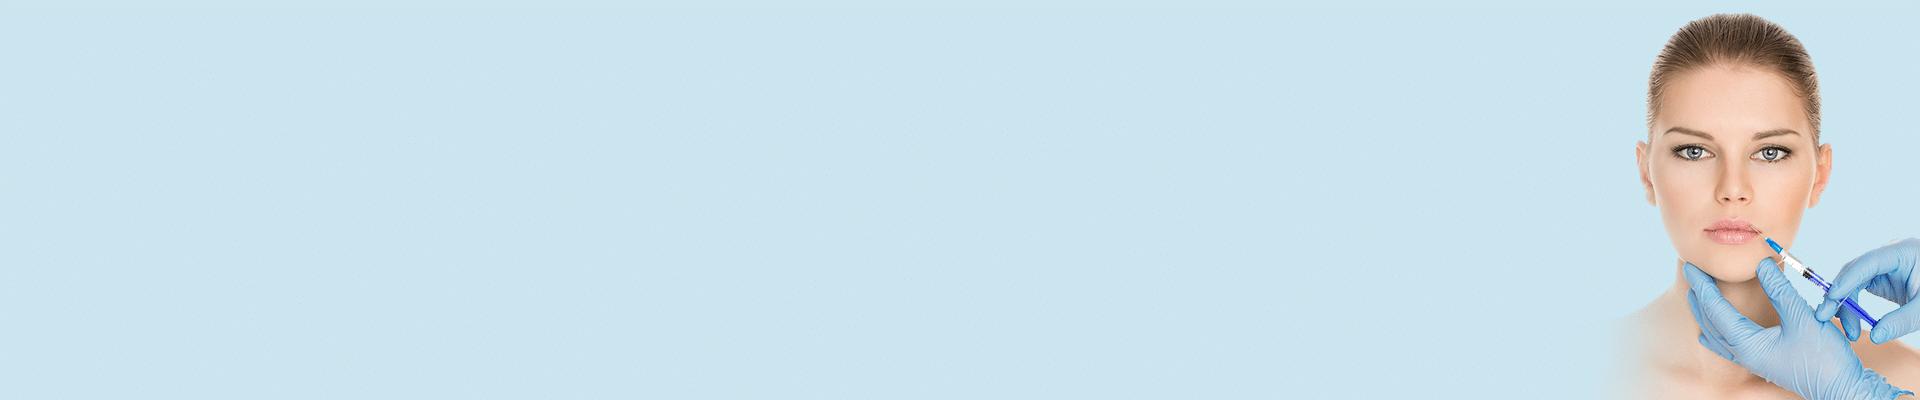 [:fr]Médecine esthétique à Nabeul : Les meilleures interventions pas cher[:ar]الطب التجميلي : أفضل عمليات طب تجميلي في نابل[:]